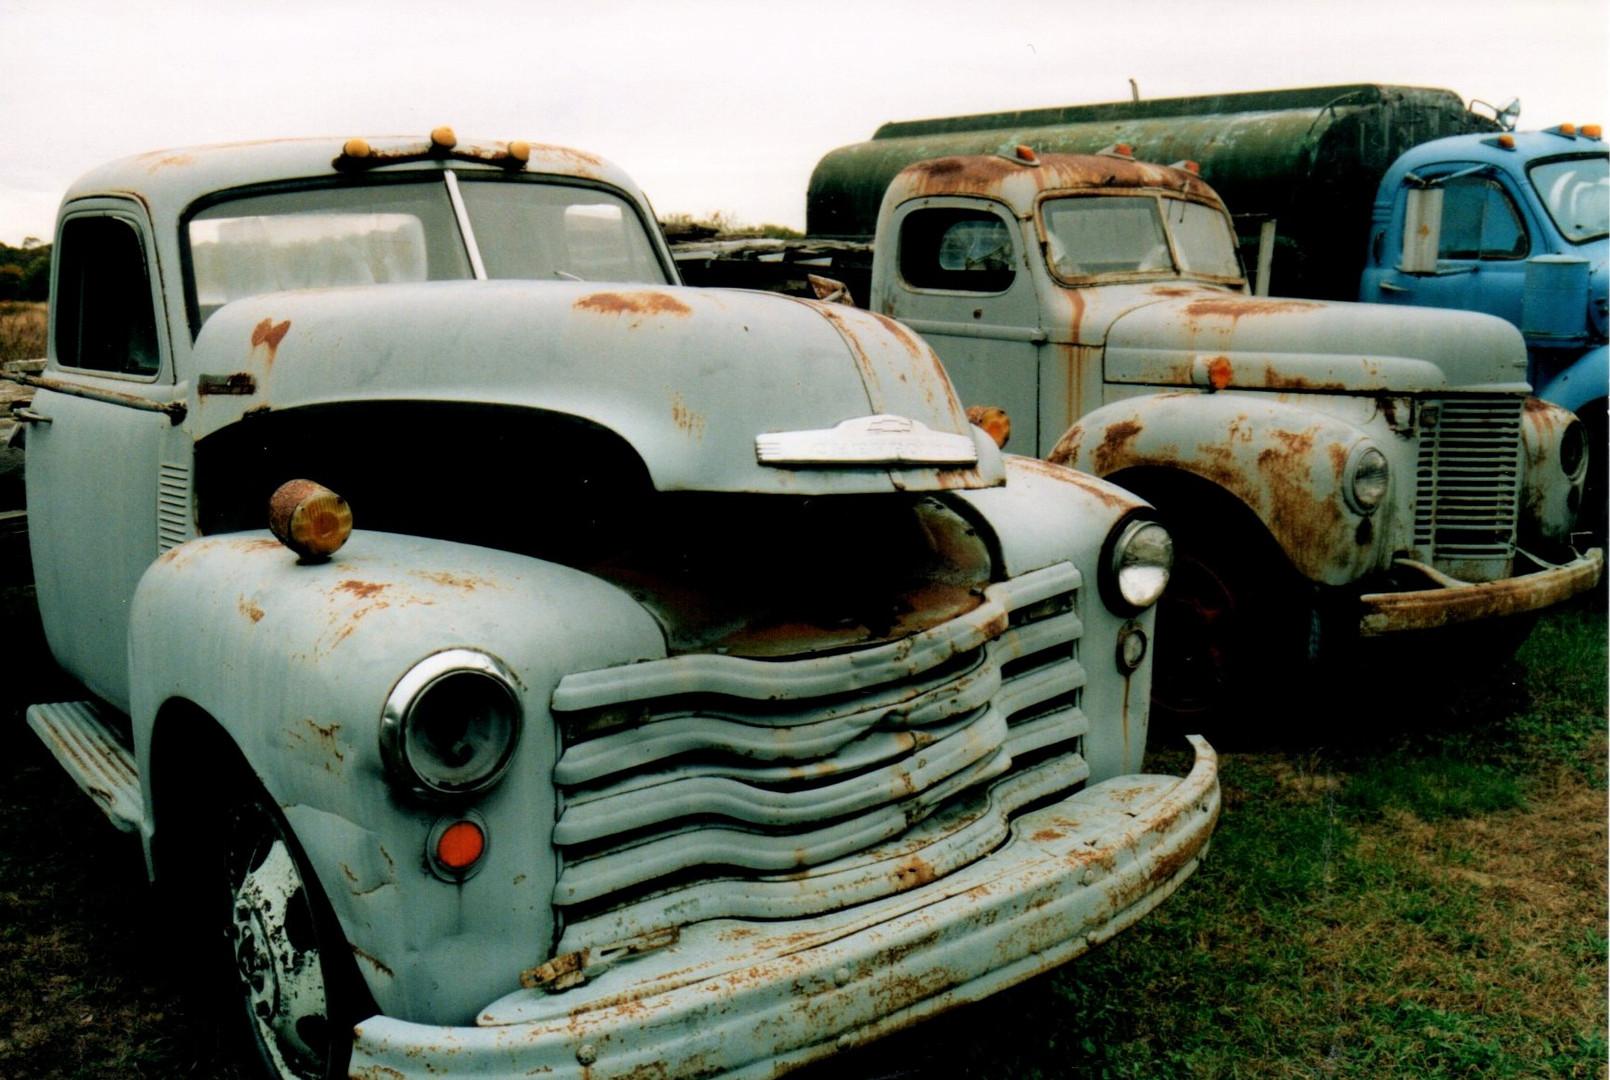 Ron Bush's collection of trucks